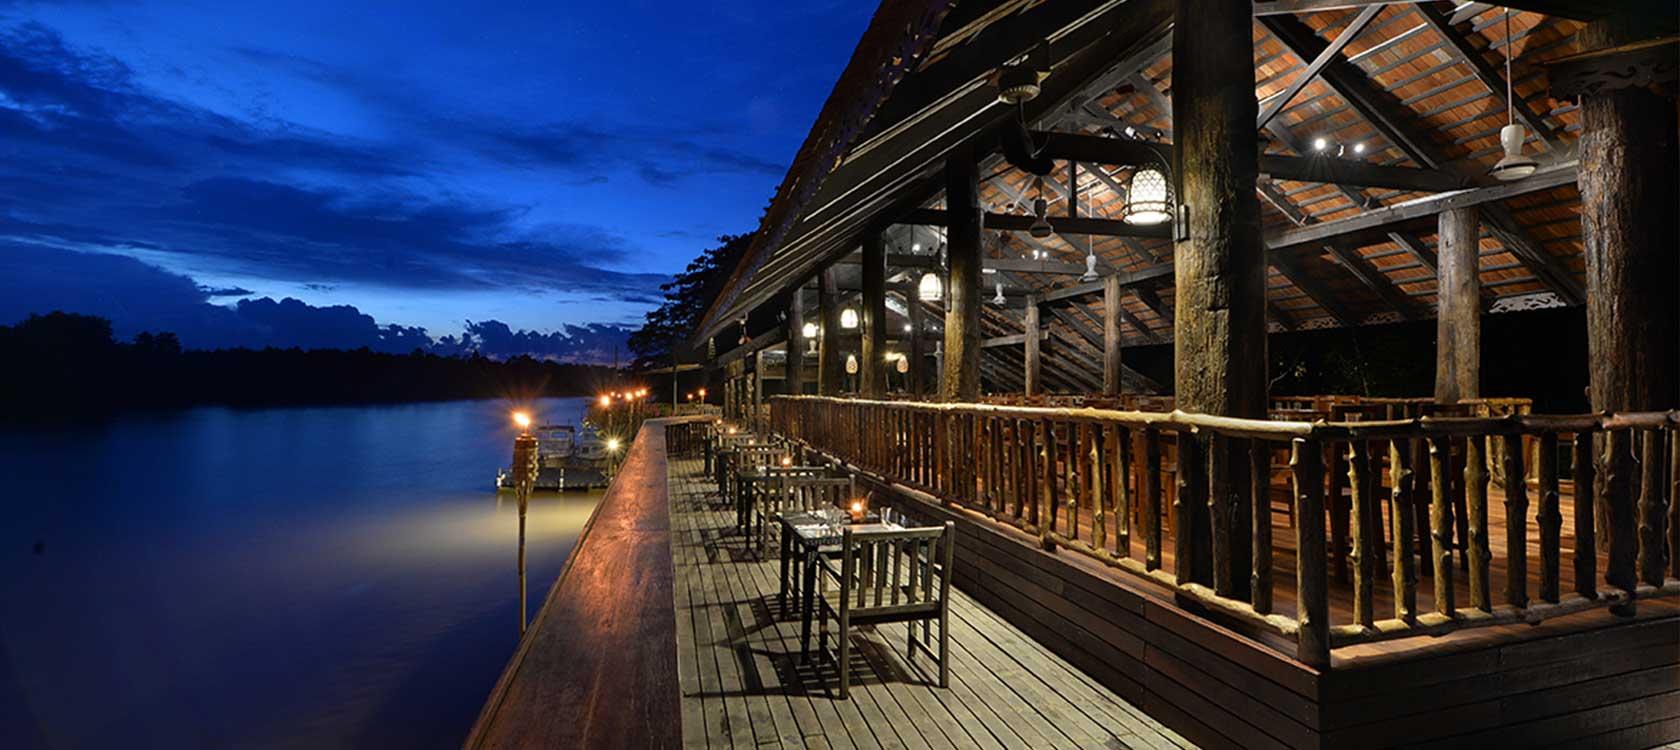 Melapi Jetty and Restaurant at Sukau Rainforest Lodge on the Kinabatangan River, Sabah